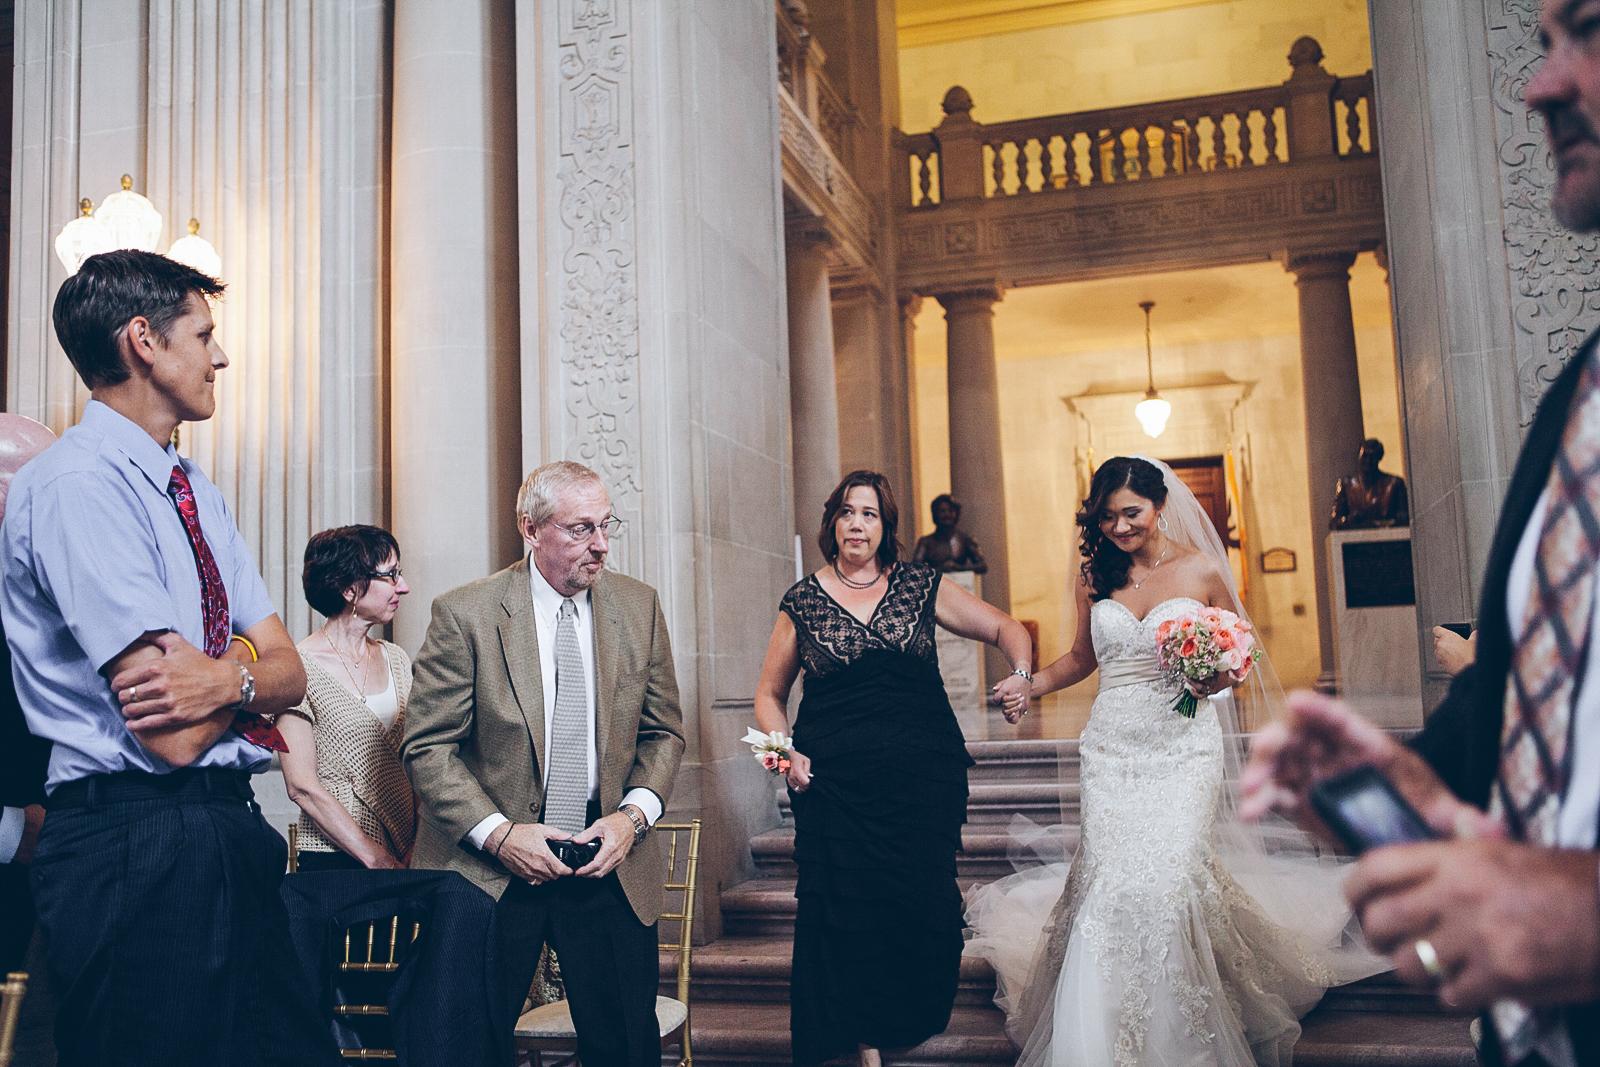 San_francisco_city_hall_wedding_photography_meegan_travis_ebony_siovhan_bokeh_photography_09.jpg